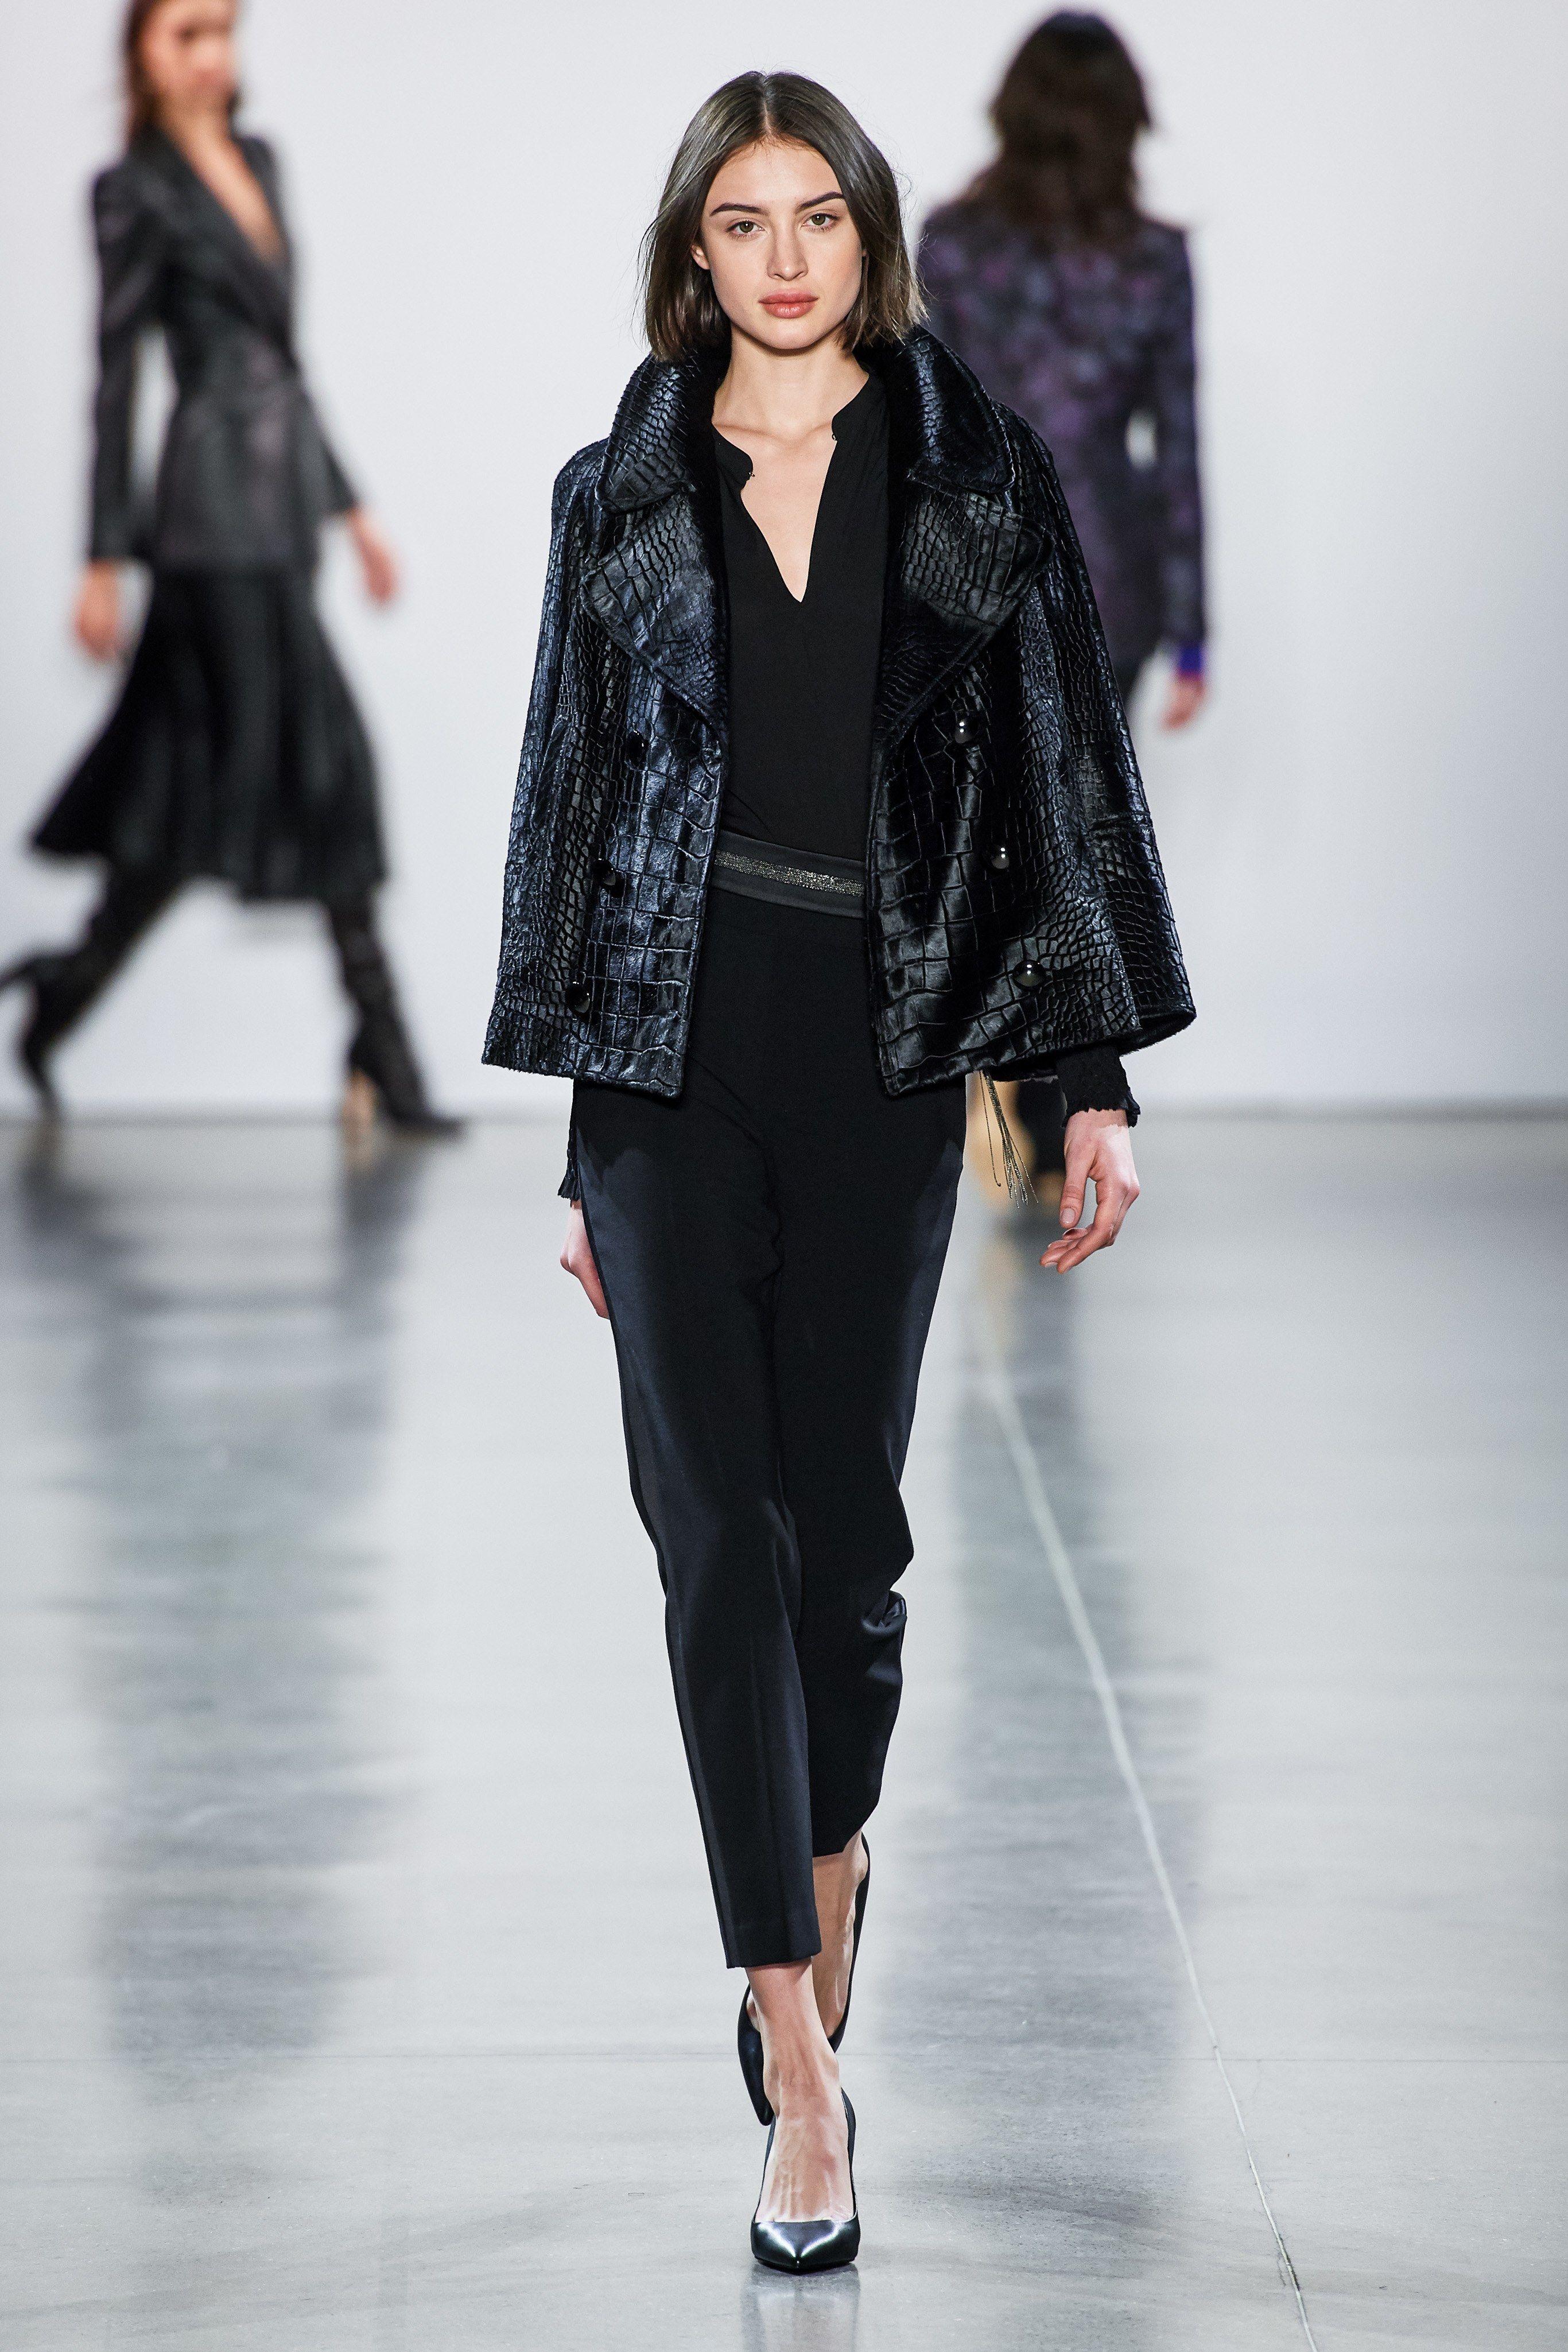 3bcafe7fdf0a8 Elie Tahari Fall 2019 Ready-to-Wear Fashion Show in 2019